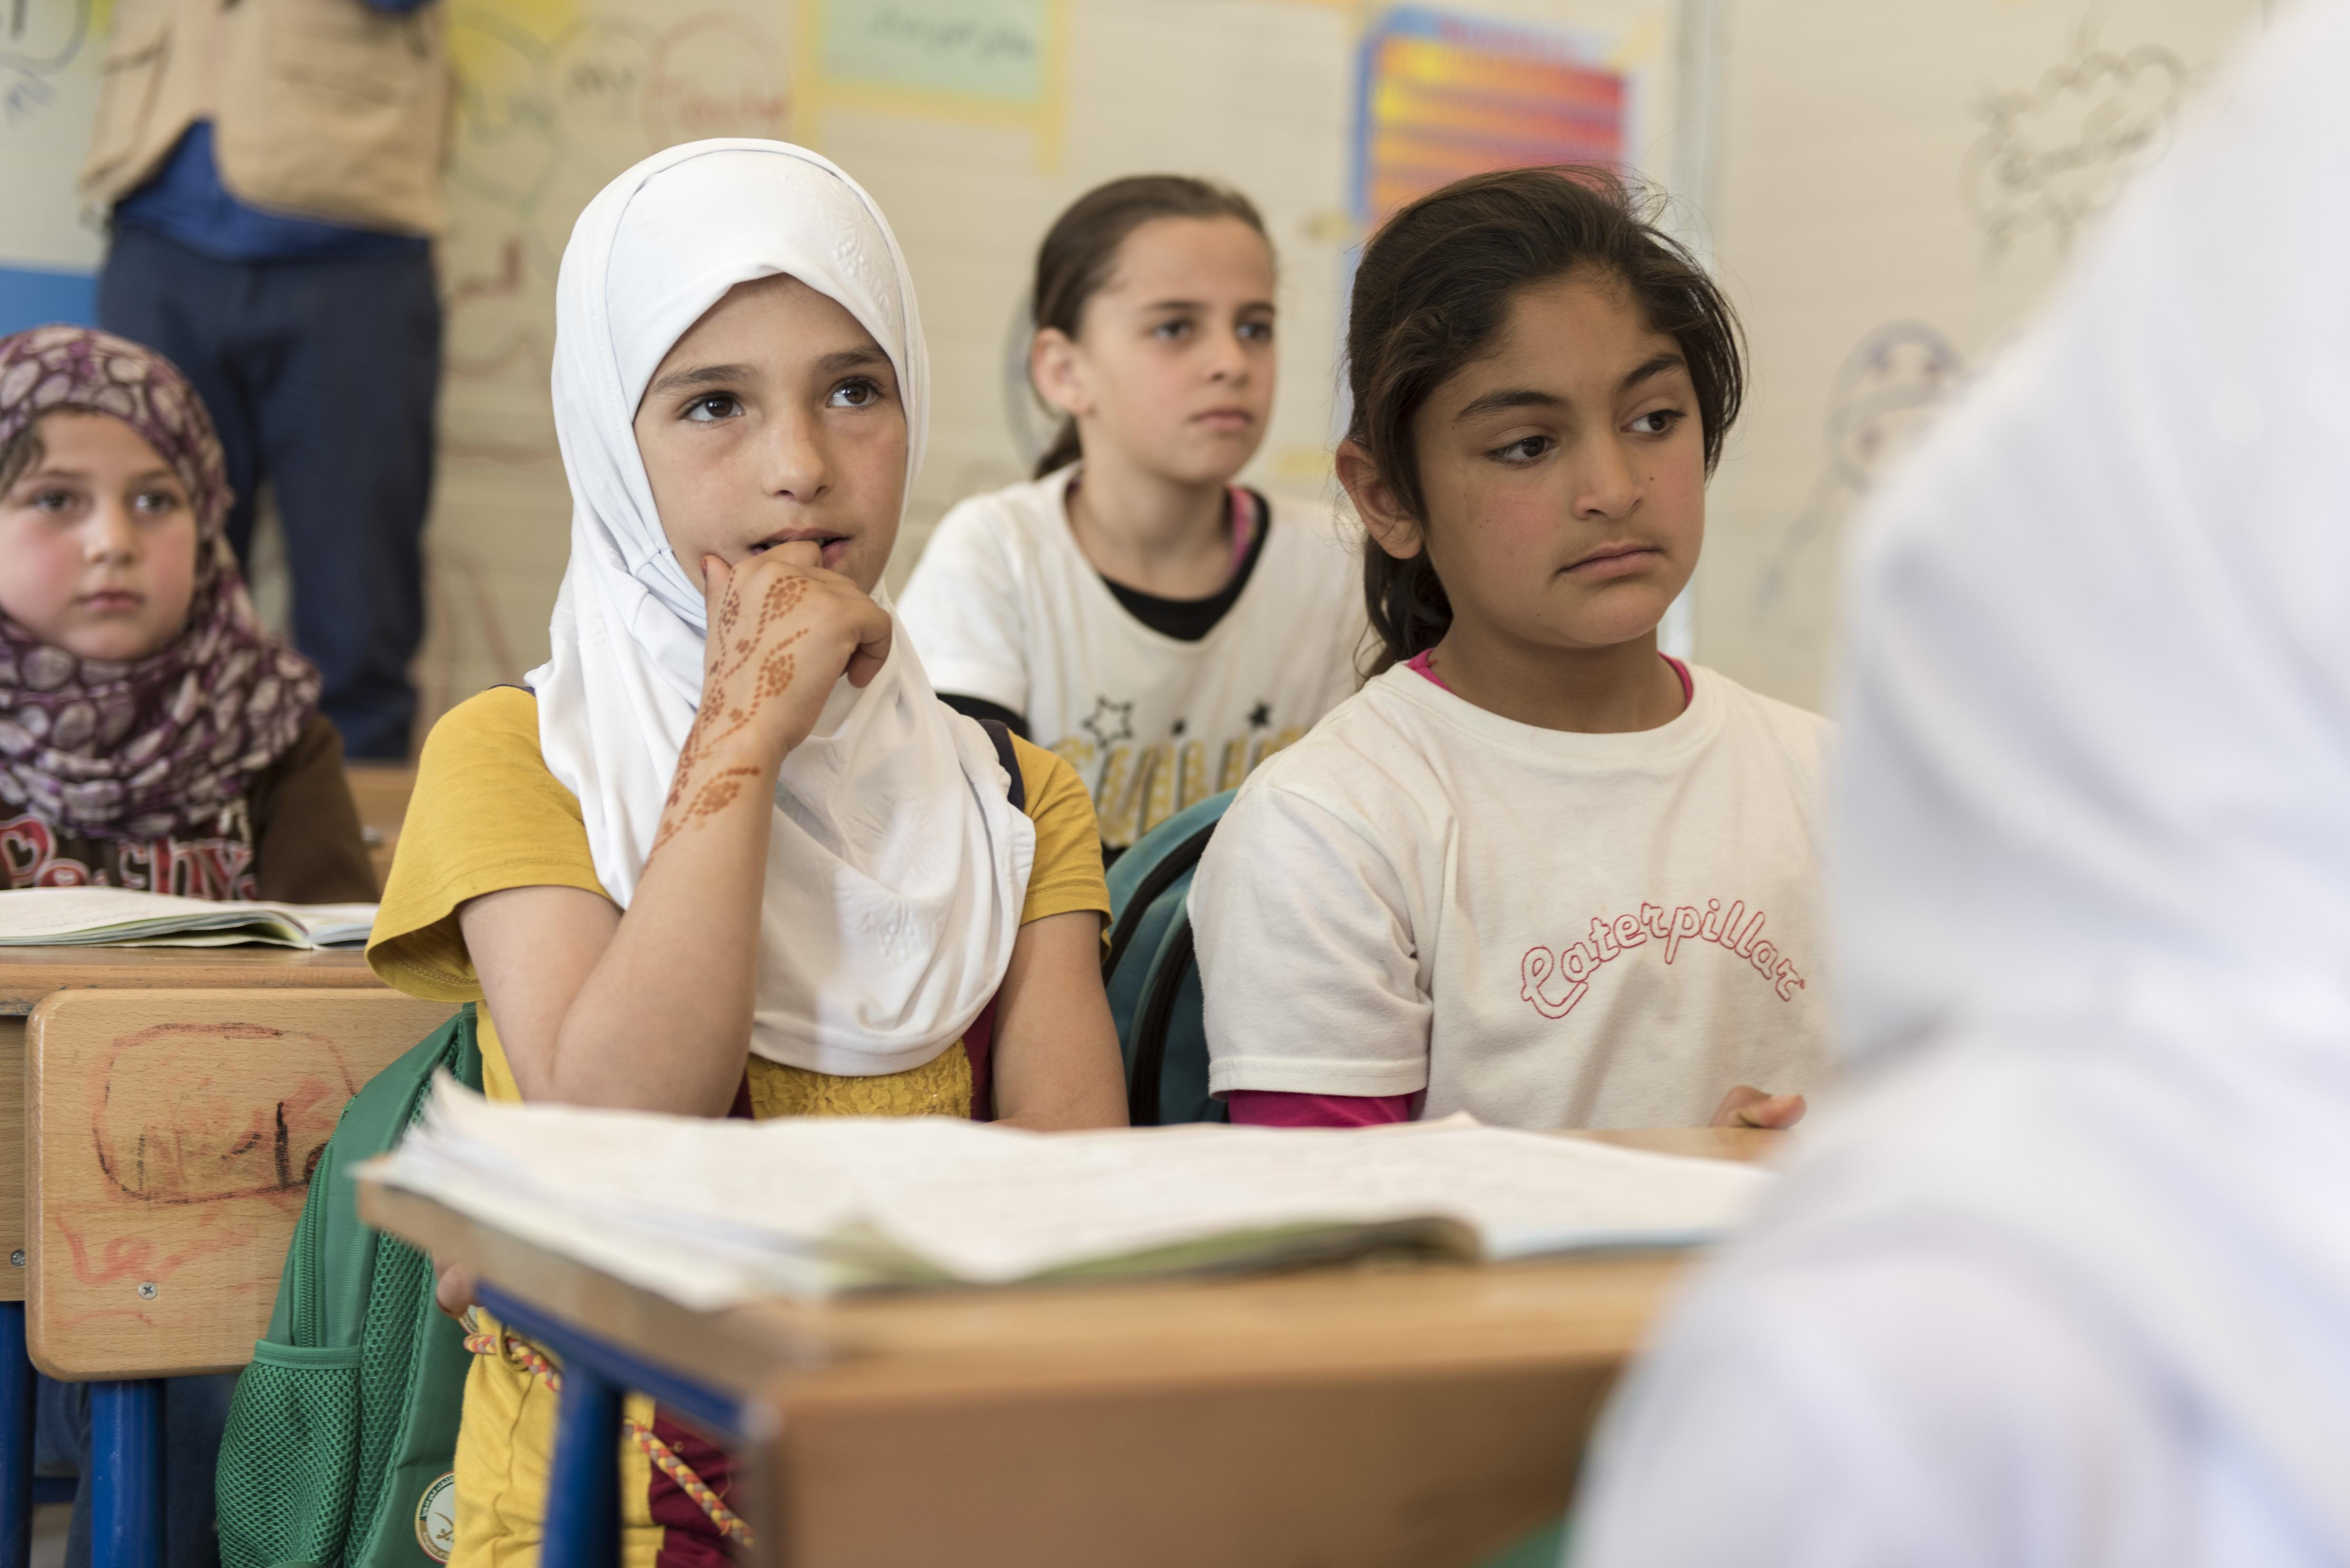 Secretary General Ban Ki-moon Visits Visit of Zaatari Refugee Camp [REMARKS & PRESS REMARKS] 10:00 Ð 10:15Ministry of Education School [District 1] (with Mrs. BAN) (Kallon) (Montiel, Alhendawi, Akiwumi, Khan) (WB delegation)